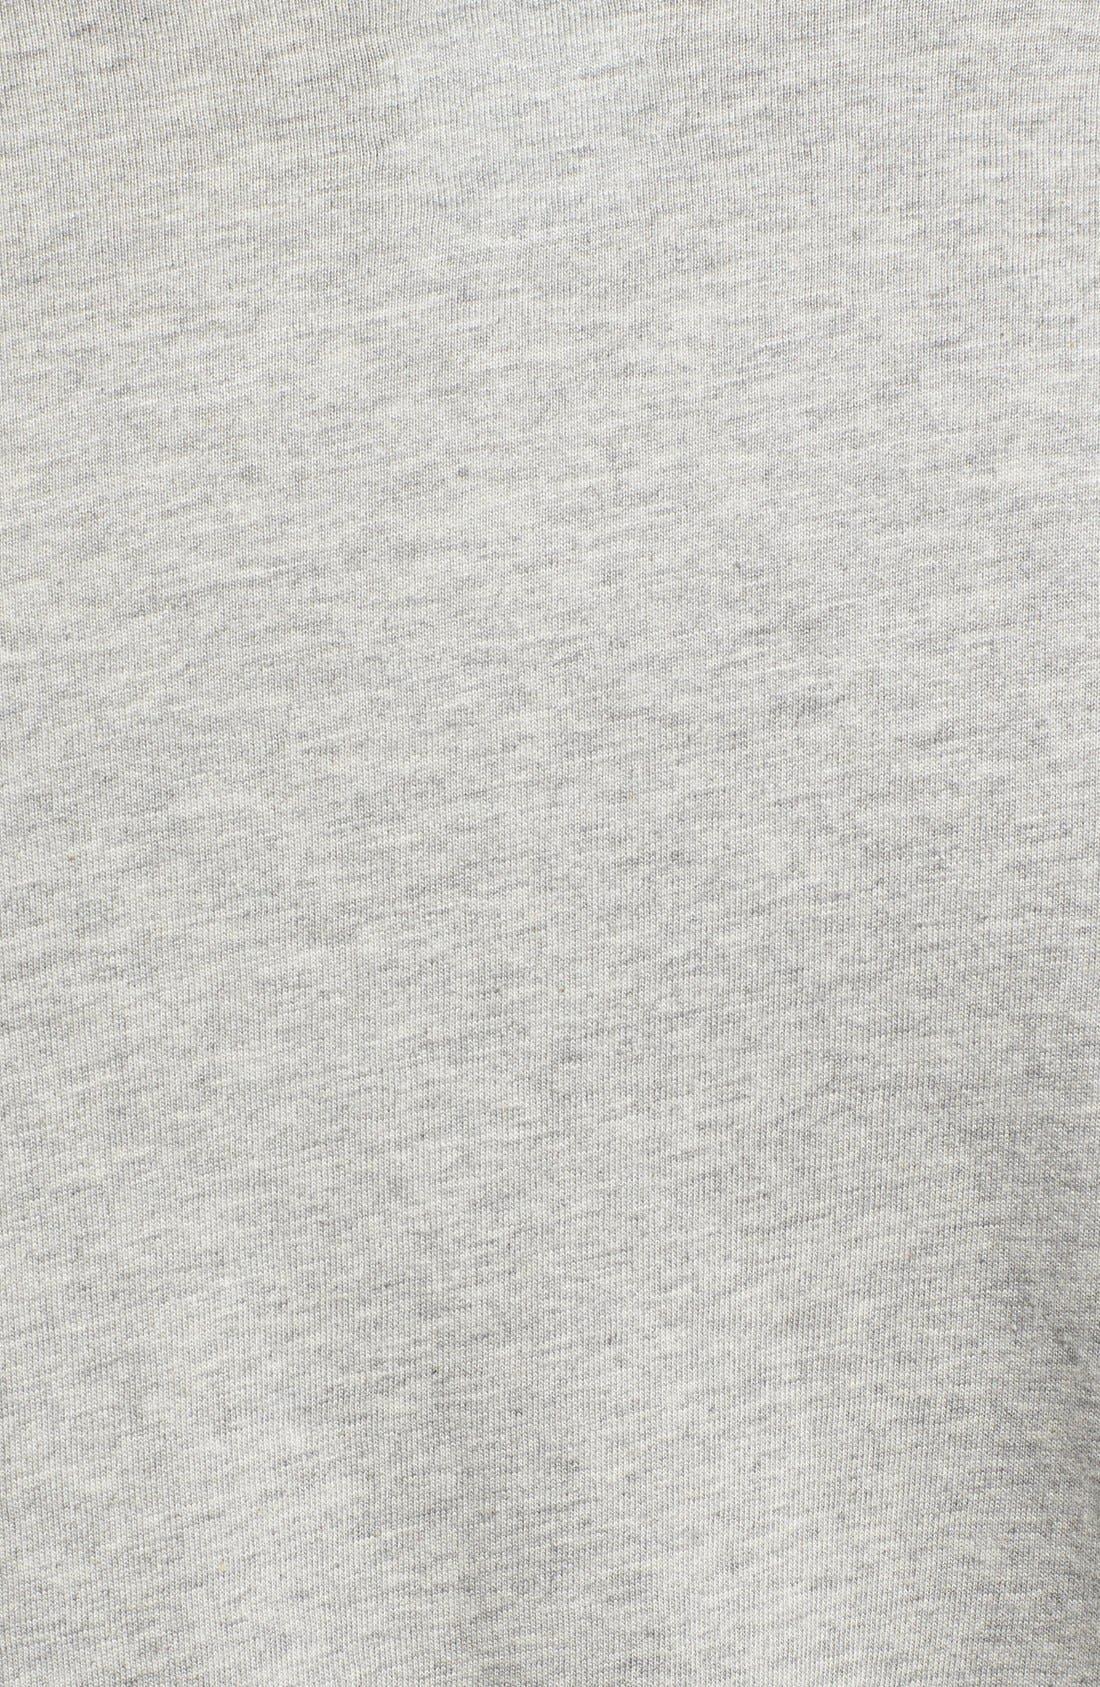 POLO RALPH LAUREN, Crewneck T-Shirt, Alternate thumbnail 3, color, ANDOVER HEATHER